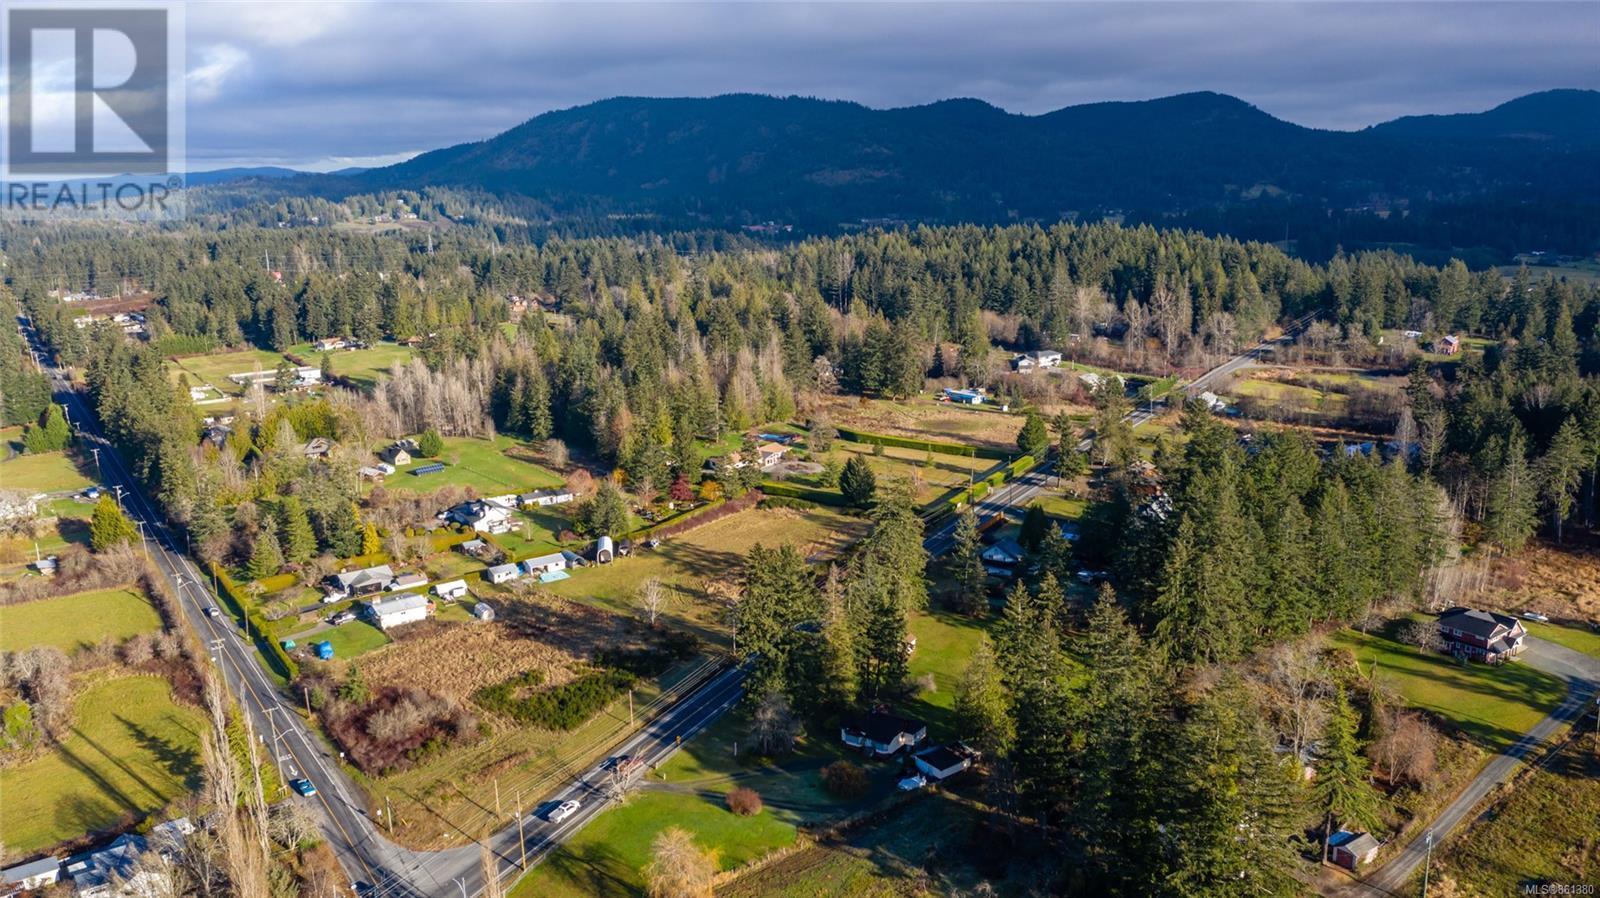 6790 Bell Mckinnon RdDuncan, British Columbia  V9L 6B7 - Photo 8 - 861380